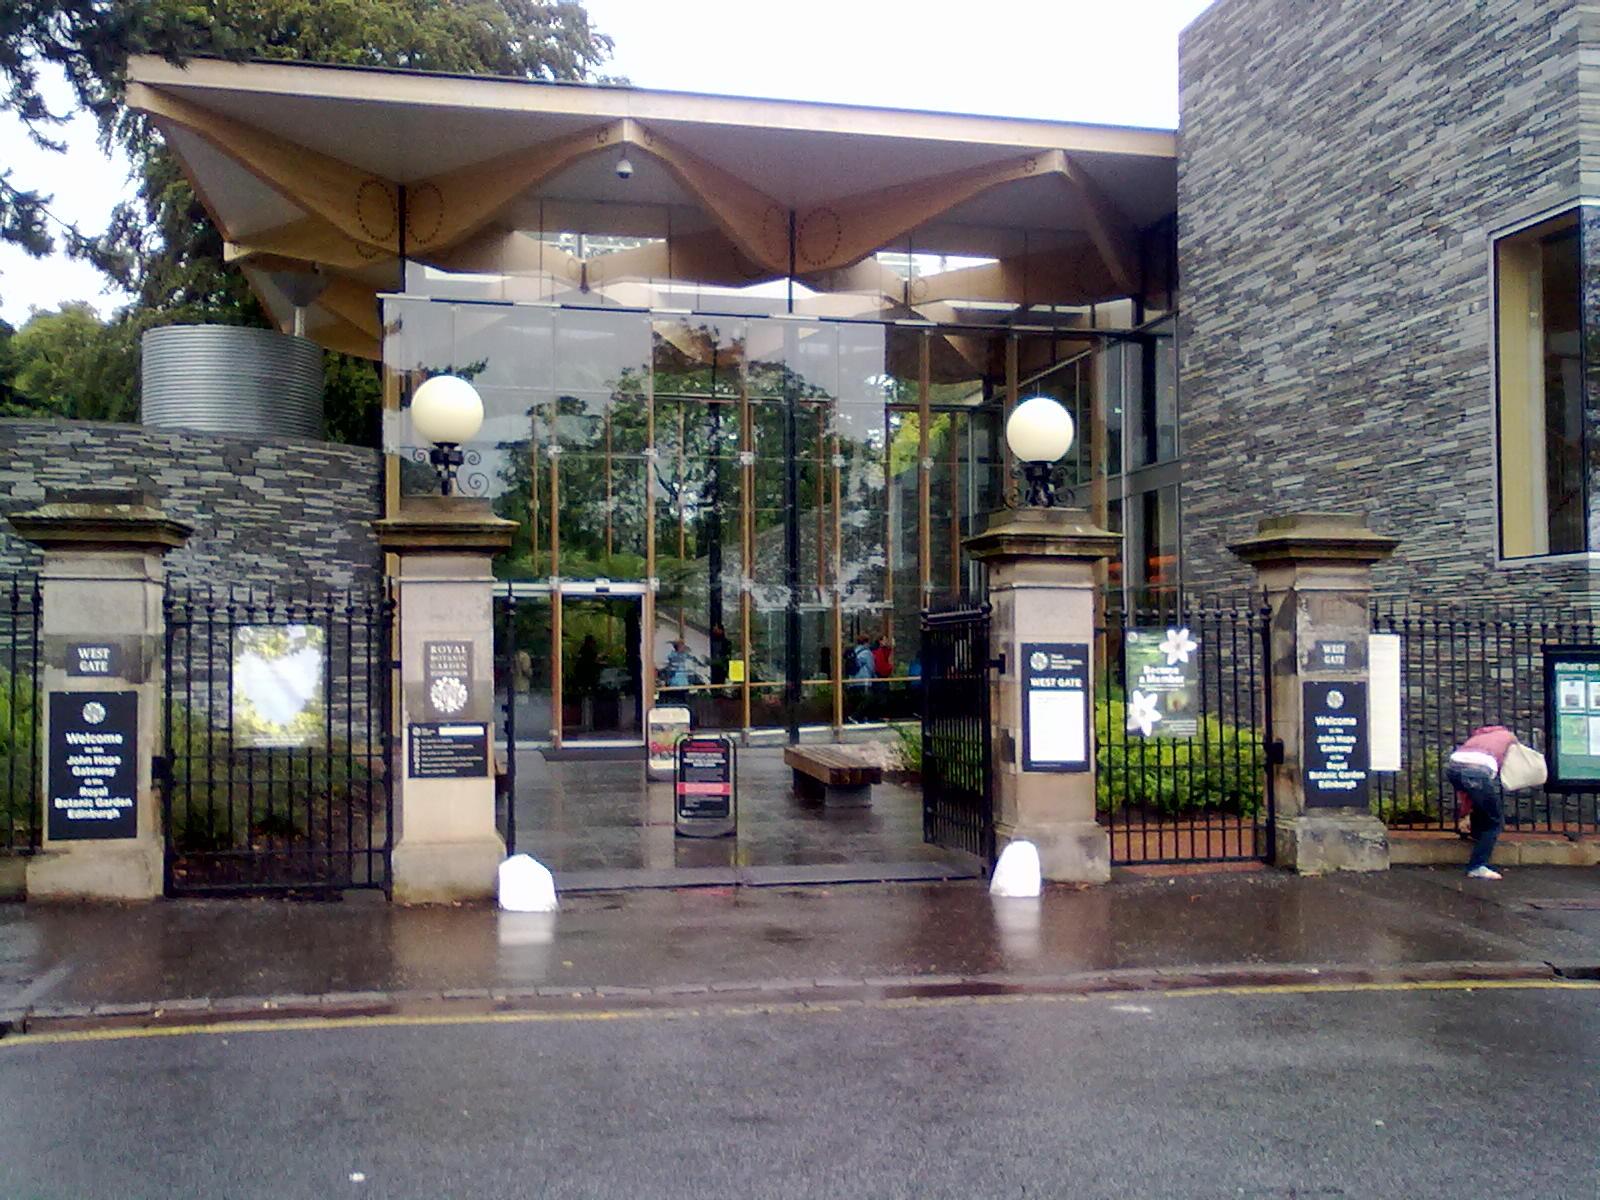 File:West Gate Entrance To Edinburghu0027s Royal Botanic Gardens 01